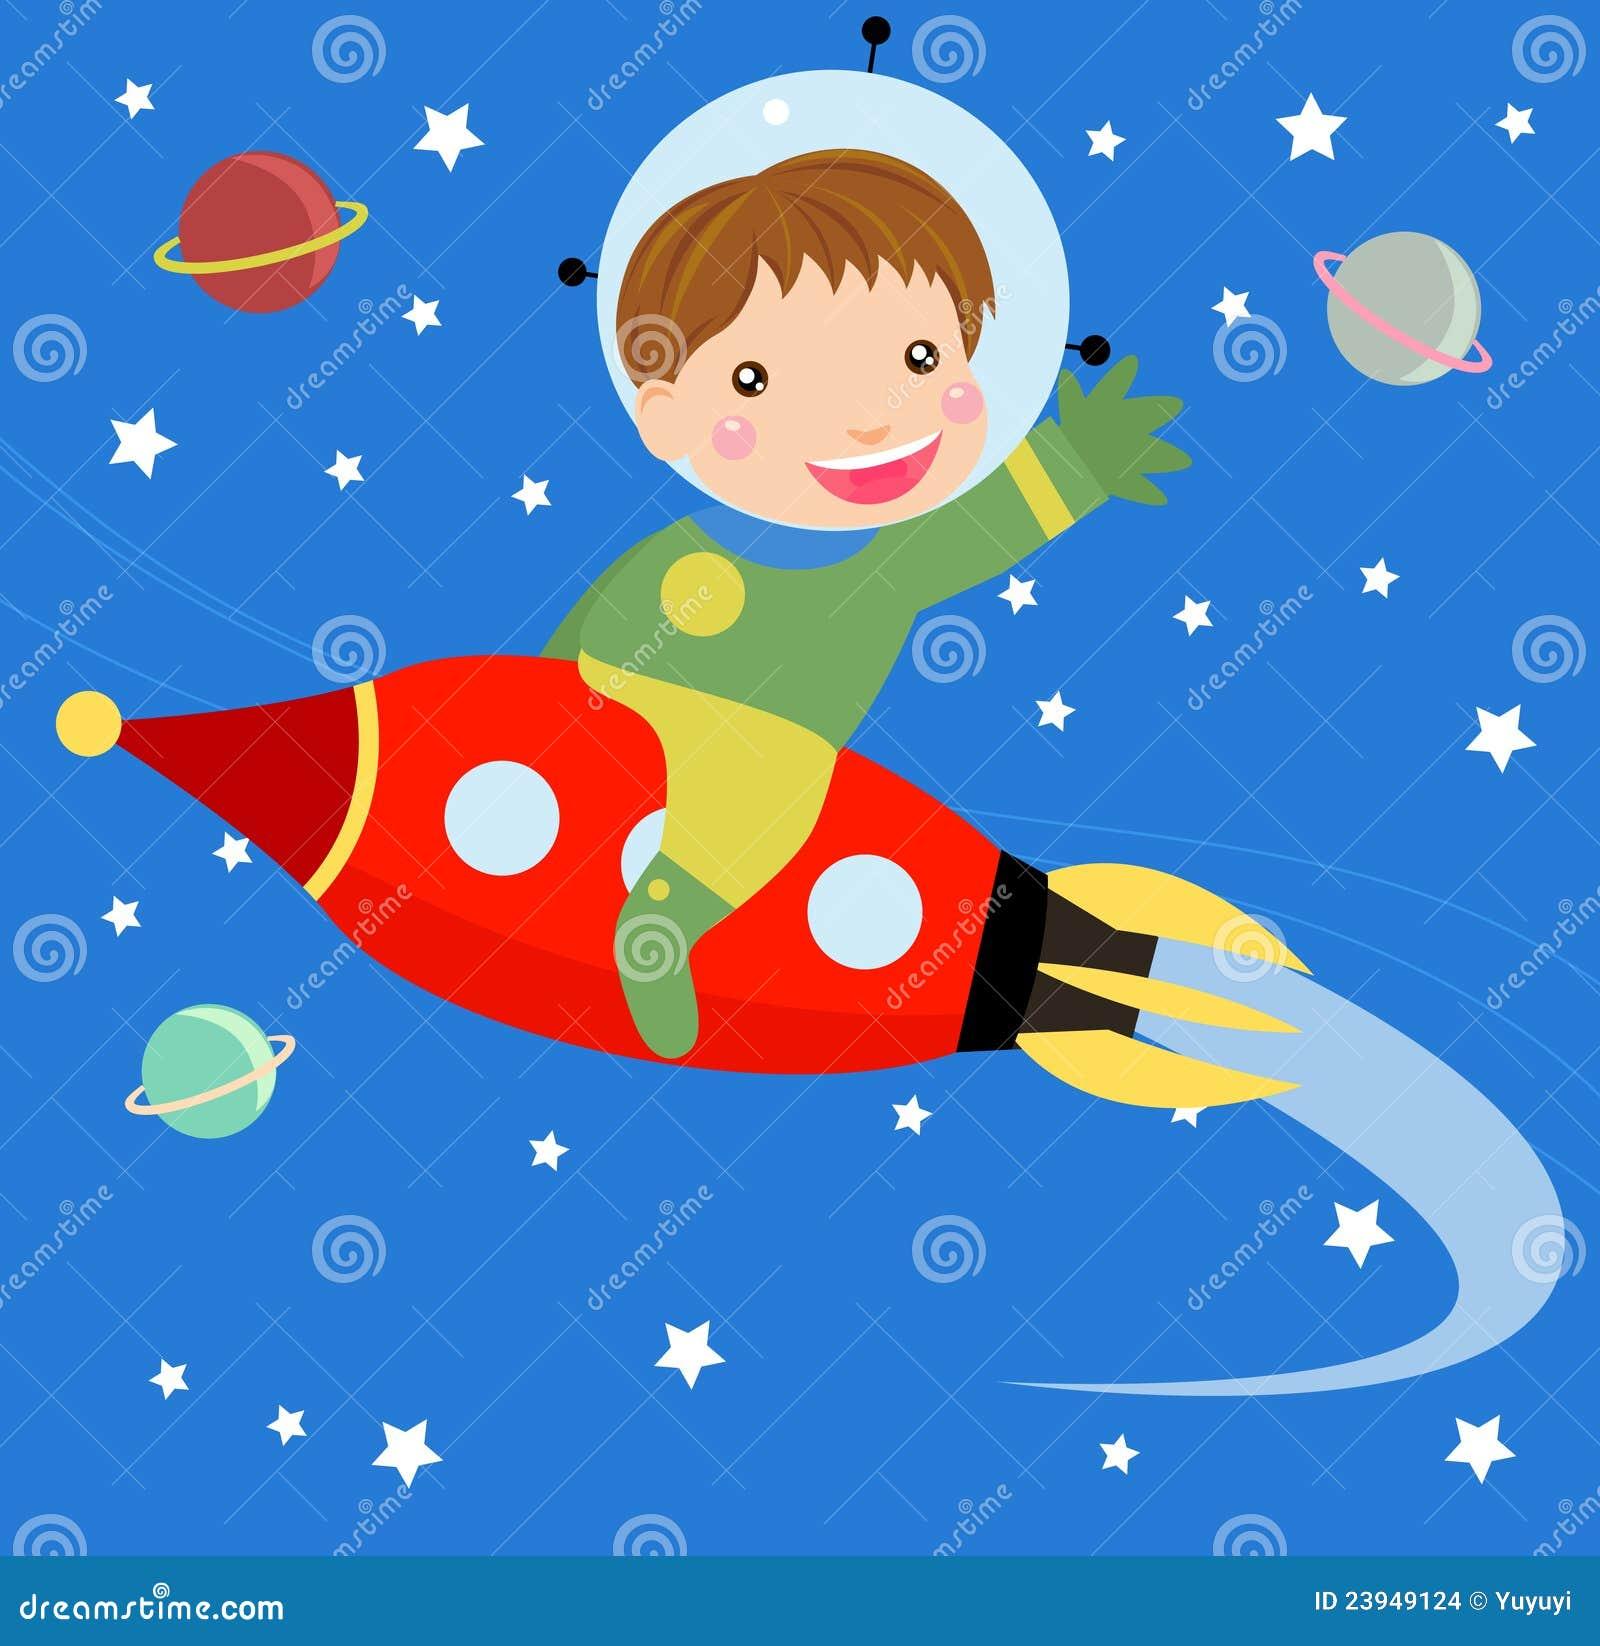 Cartoon boy fly riding red fast rocket.